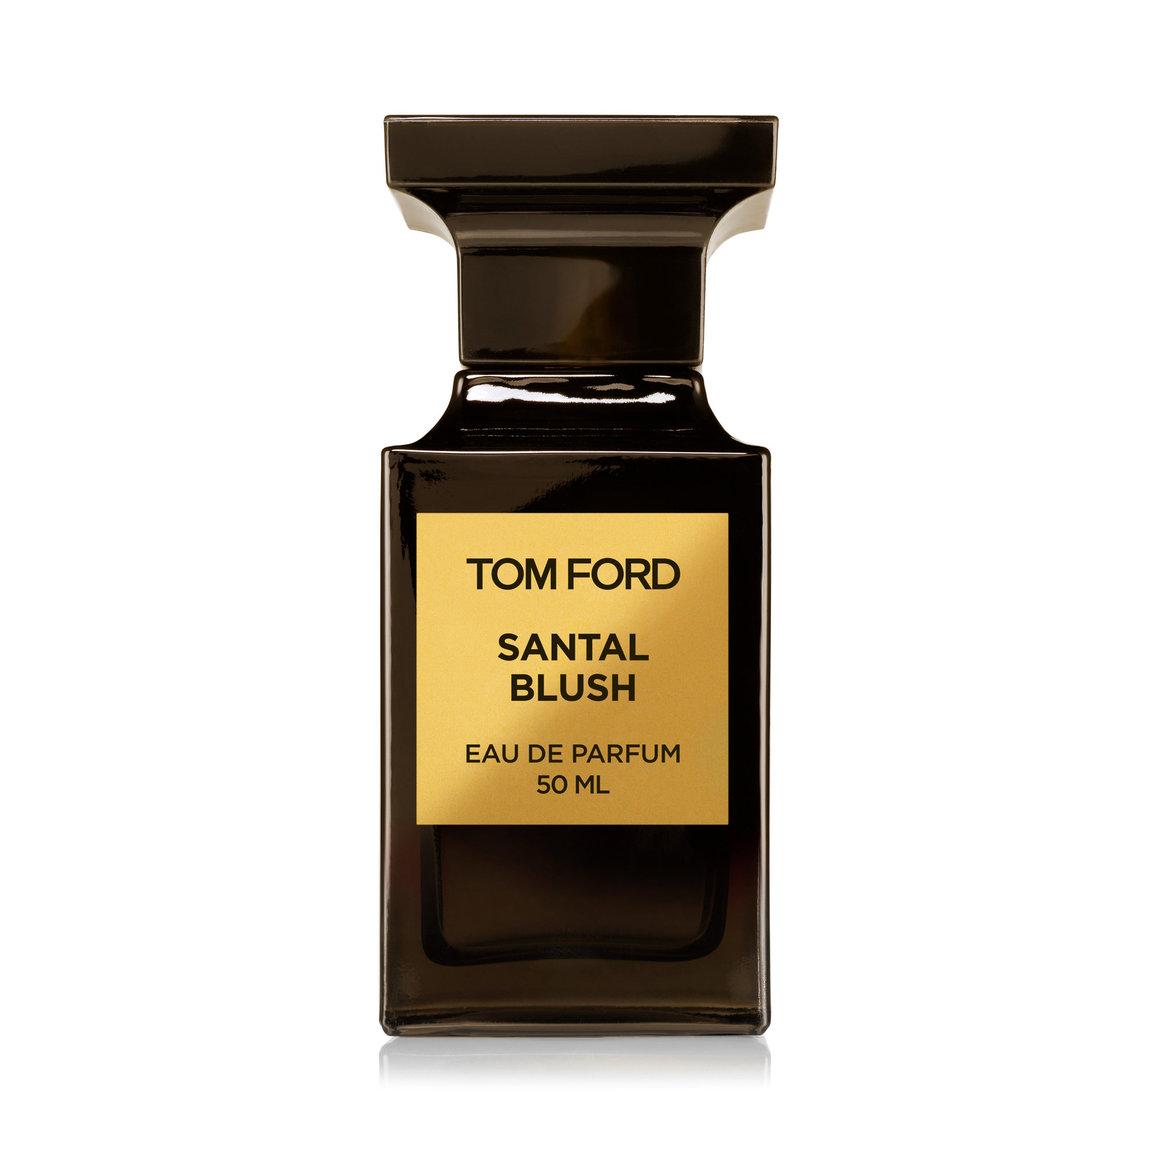 TOM FORD Santal Blush product swatch.